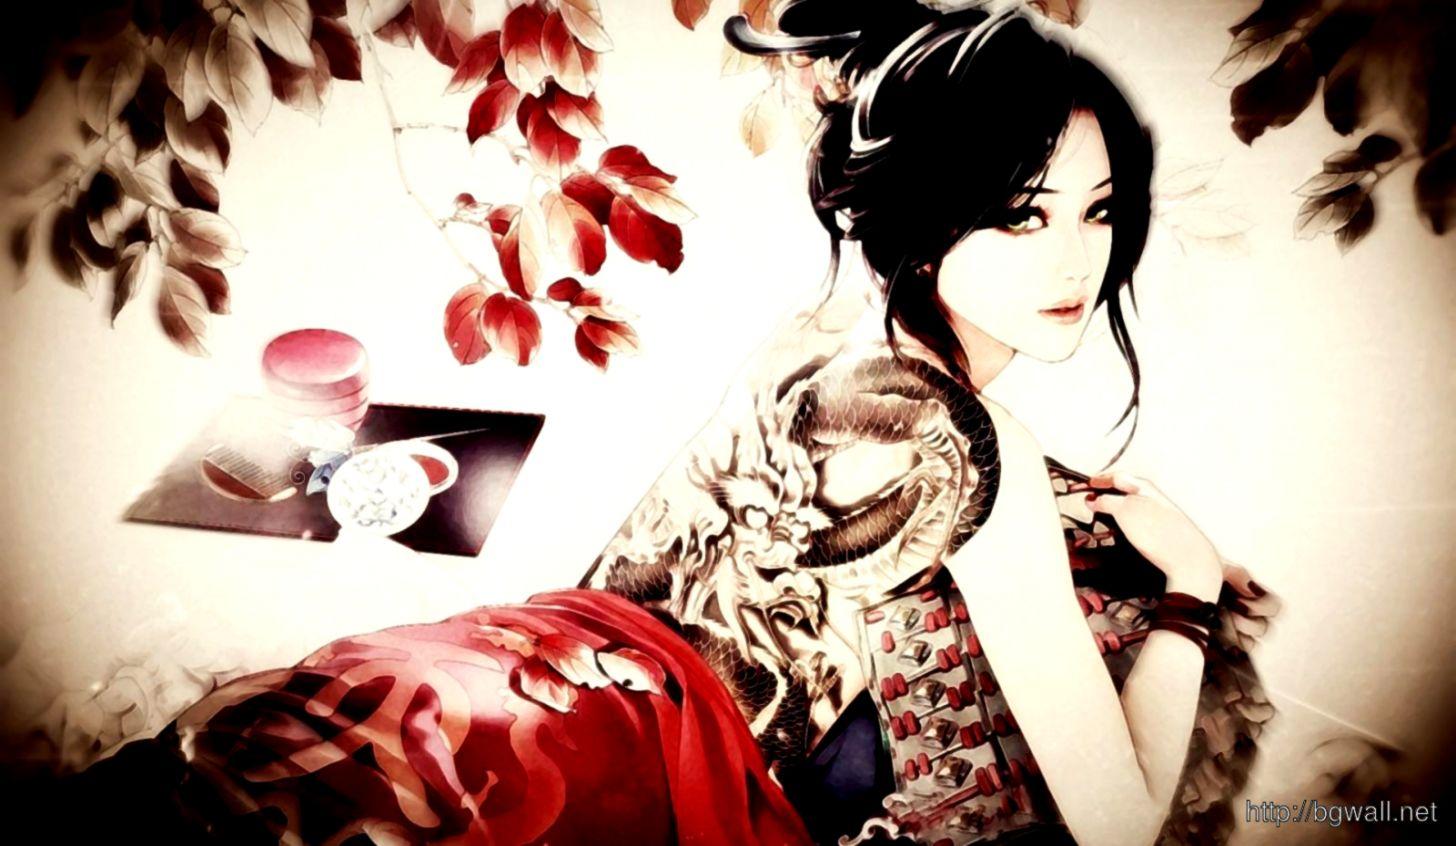 Japanese Model Wallpaper Hd